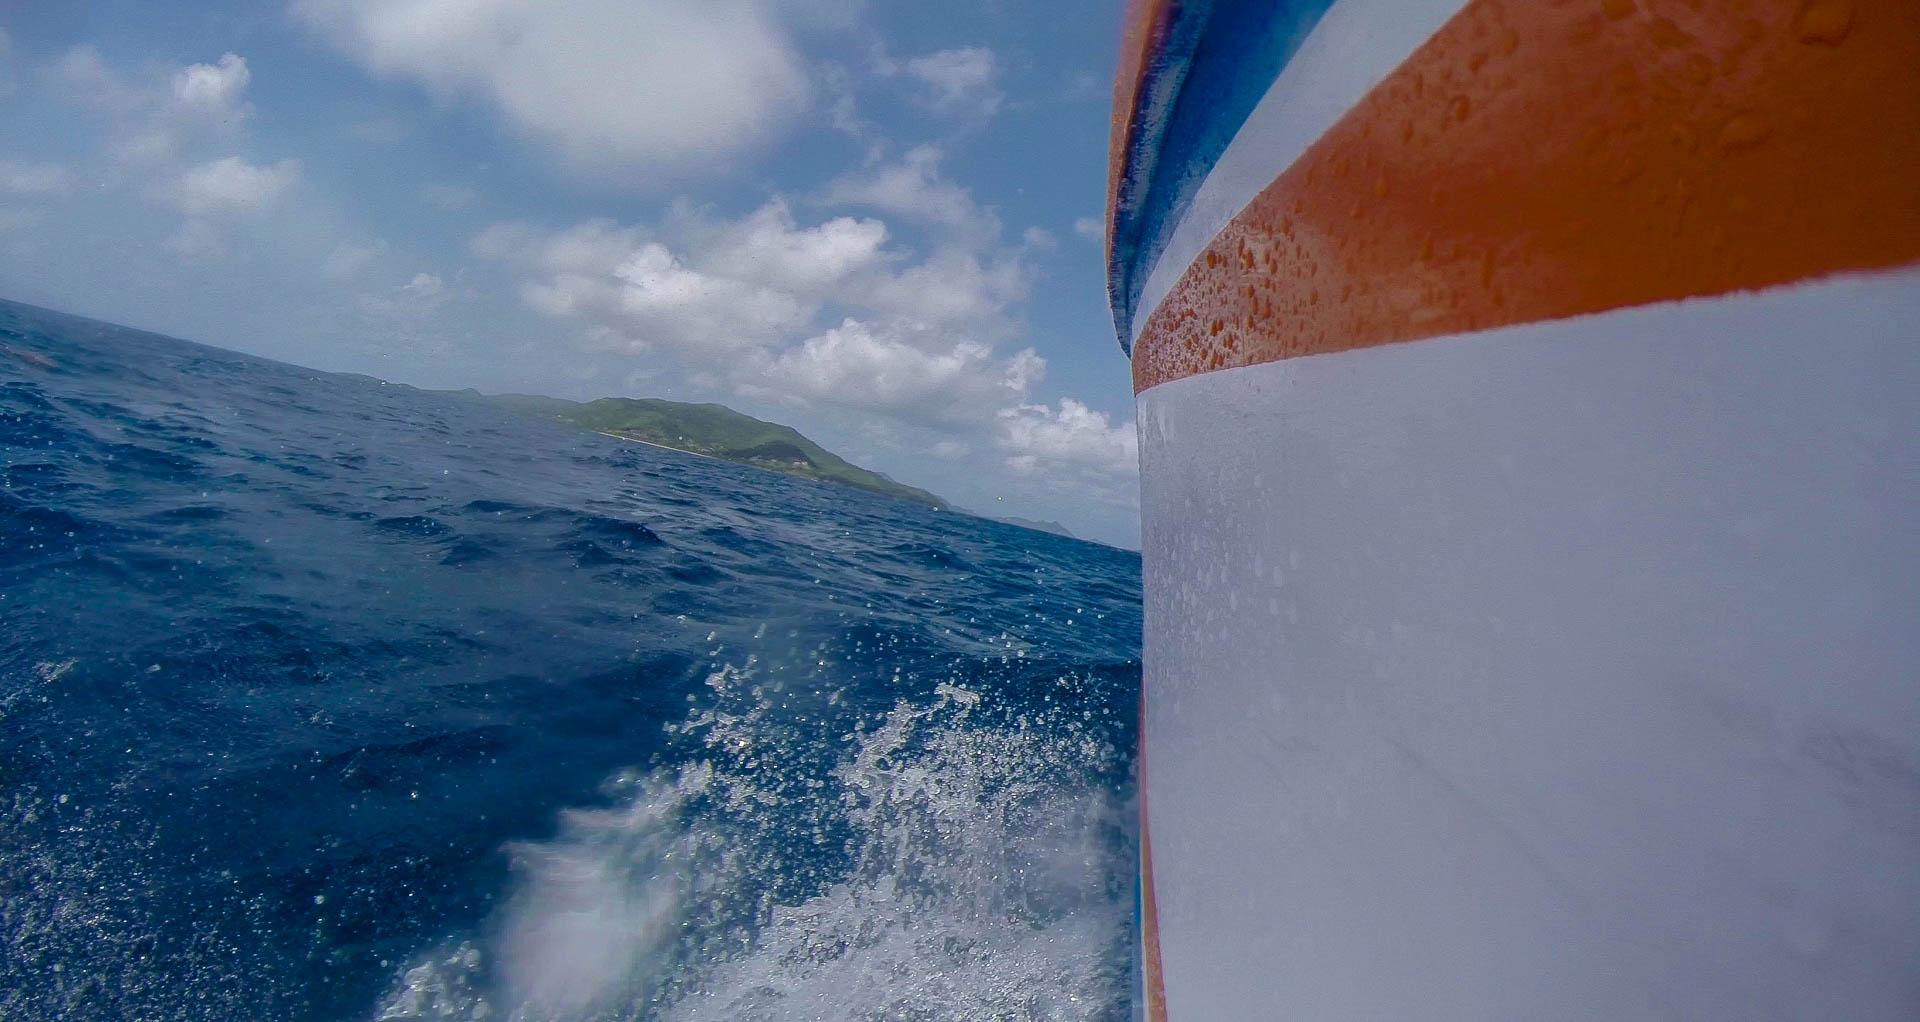 Speeding toward Carriacou- Video Still, Tom Miller